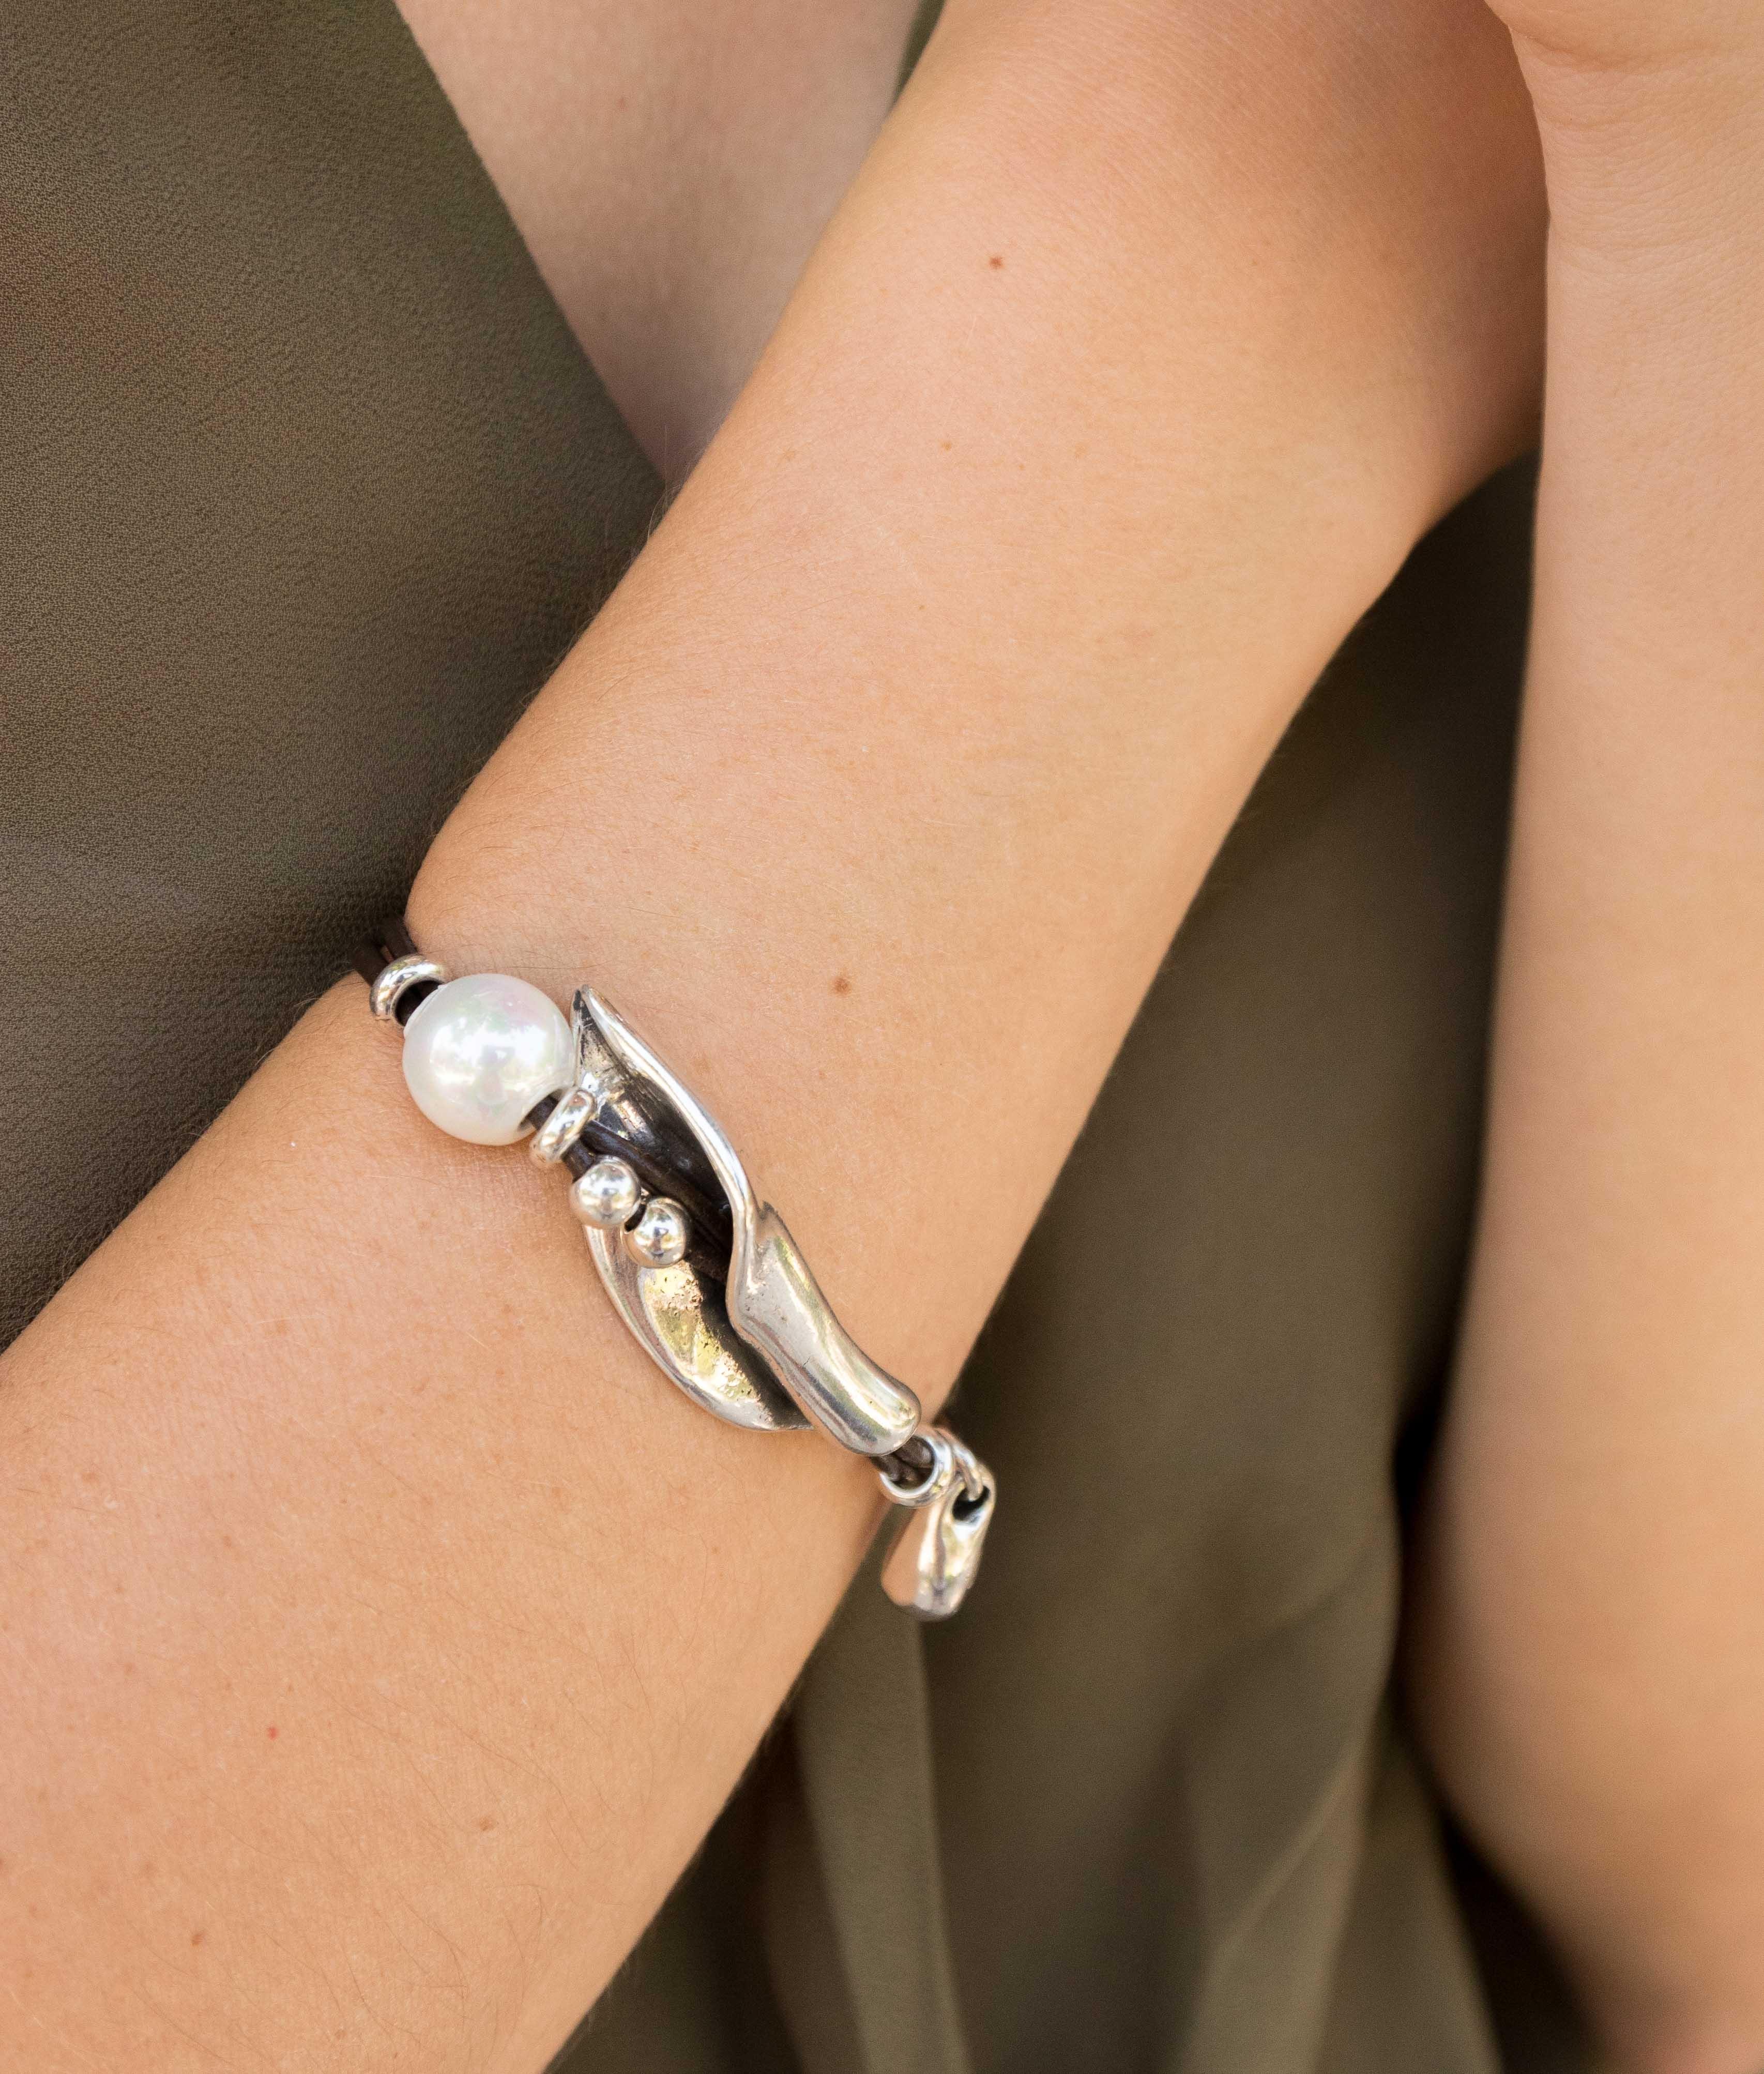 Bracelet Peta-lo Perla - Silver